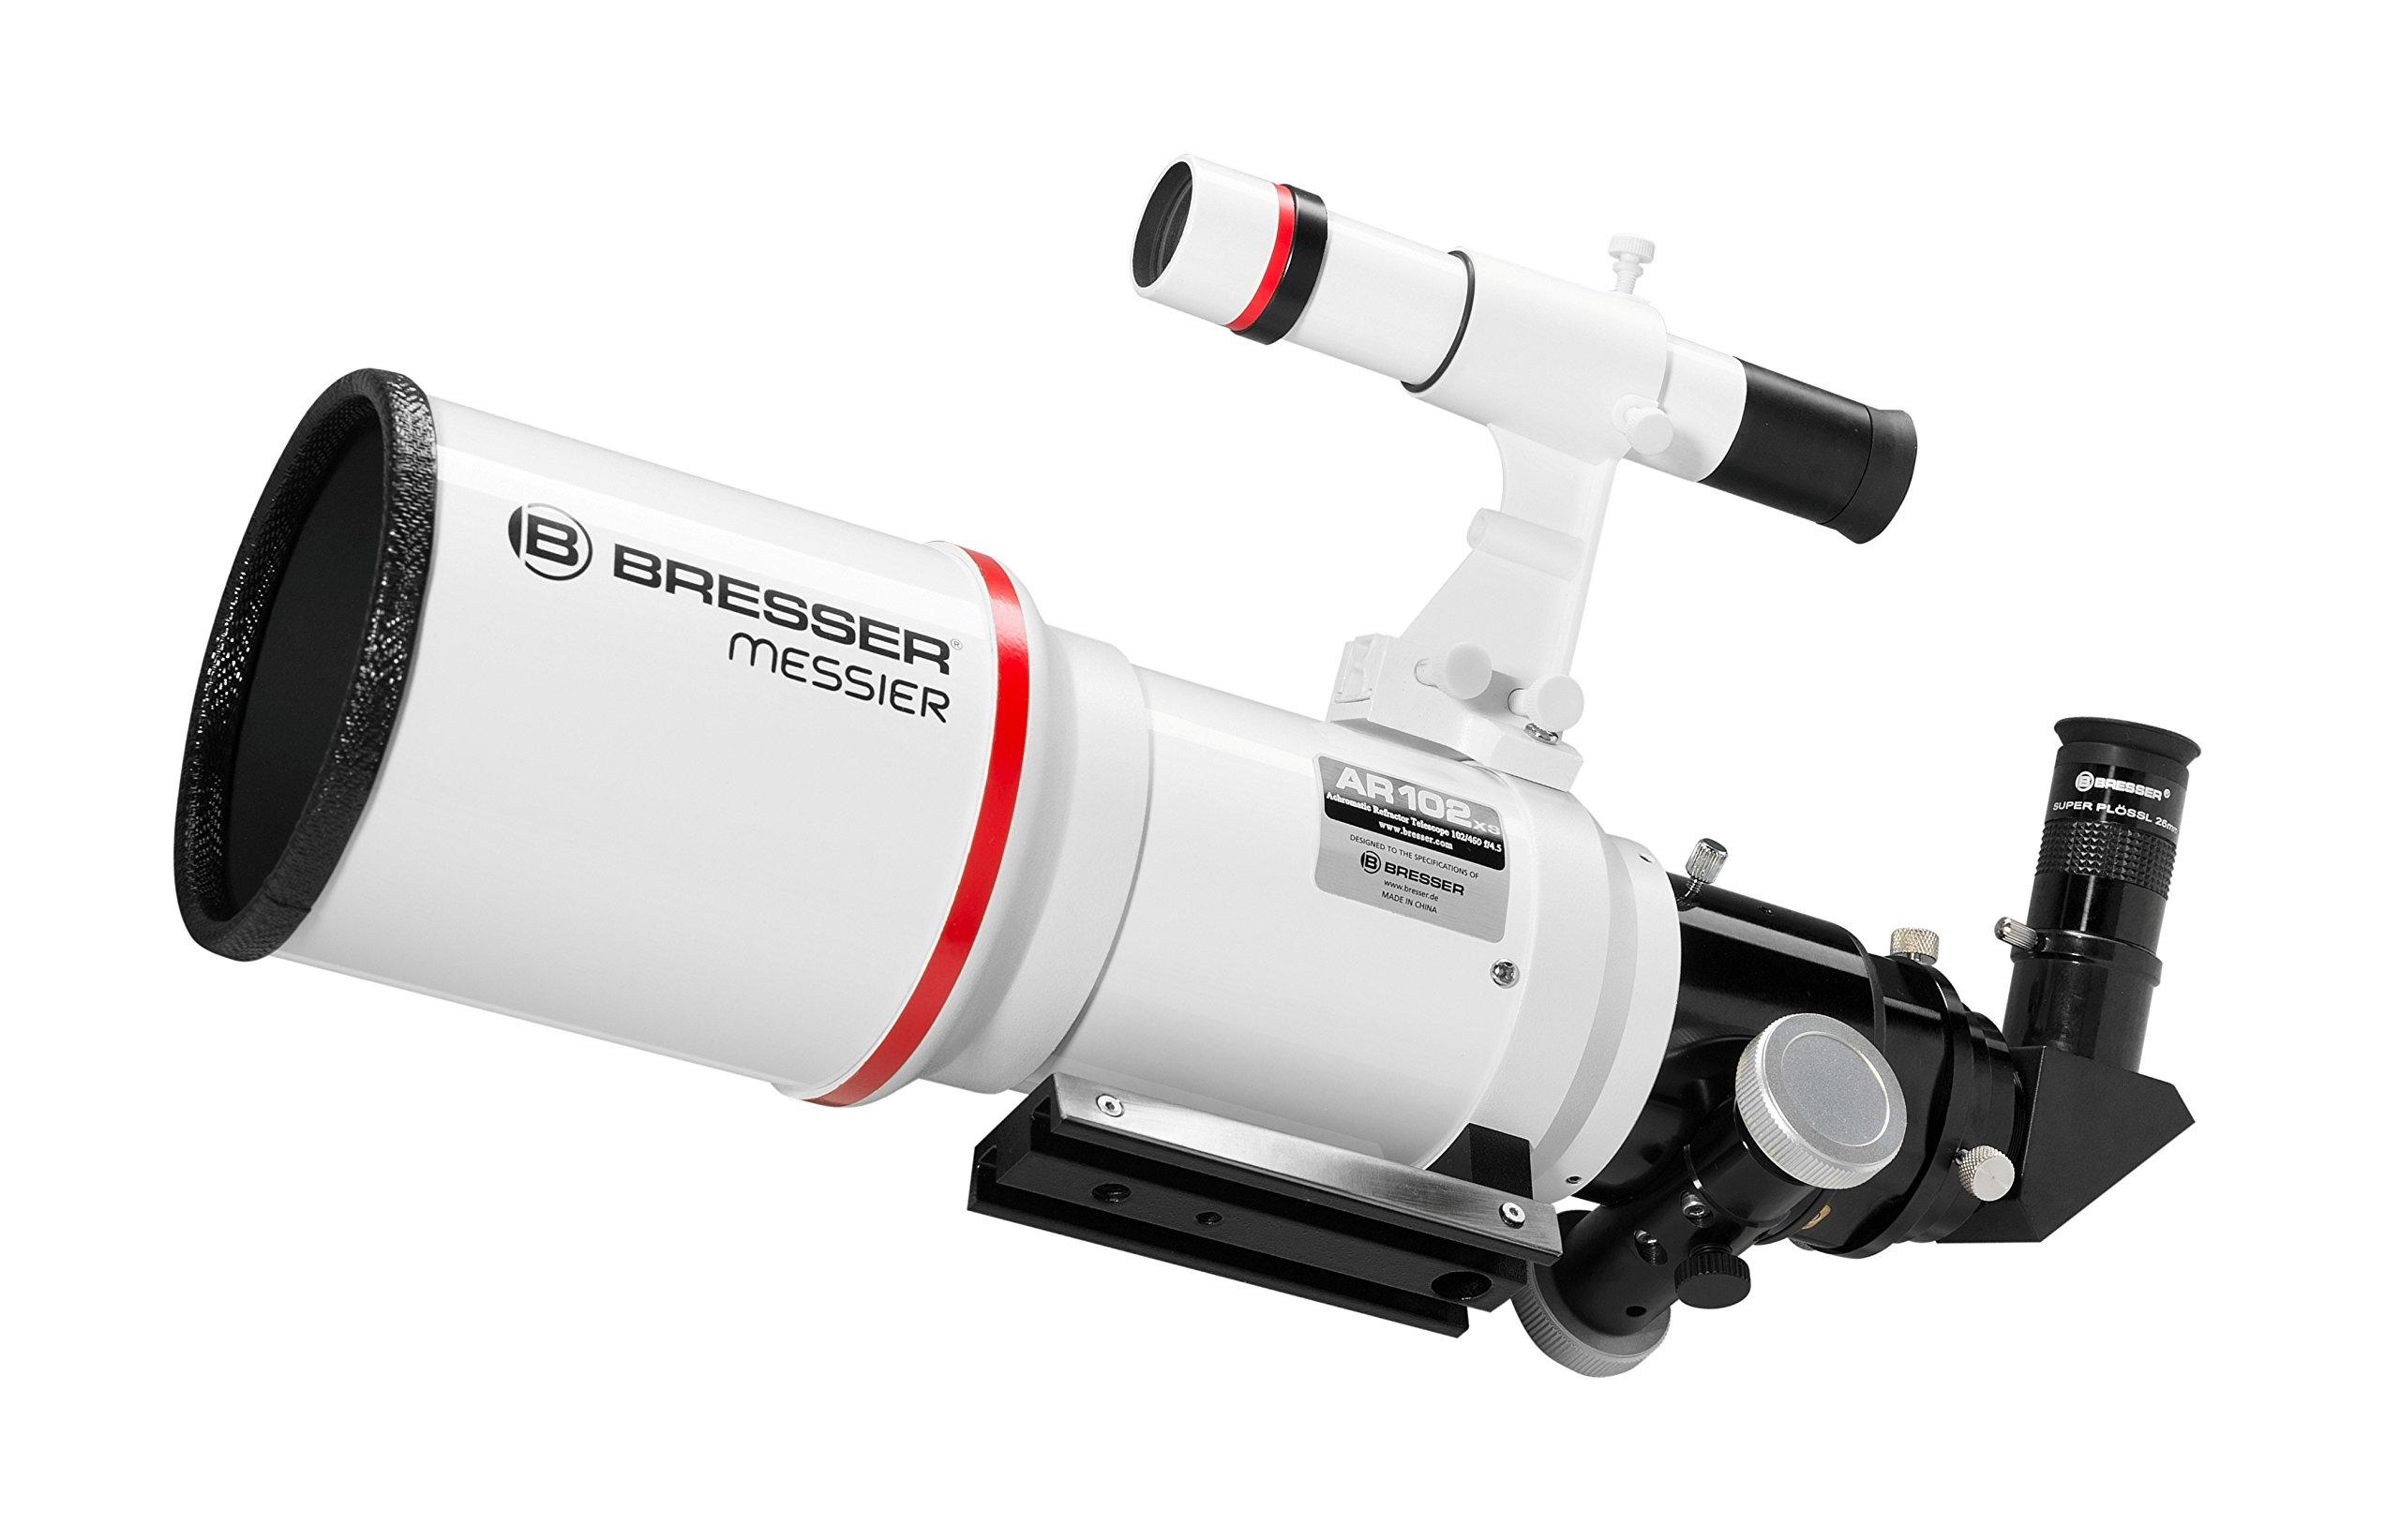 Bresser Refractor Messier AR-102xs/460 Telescope with Hexafoc Focuser - White